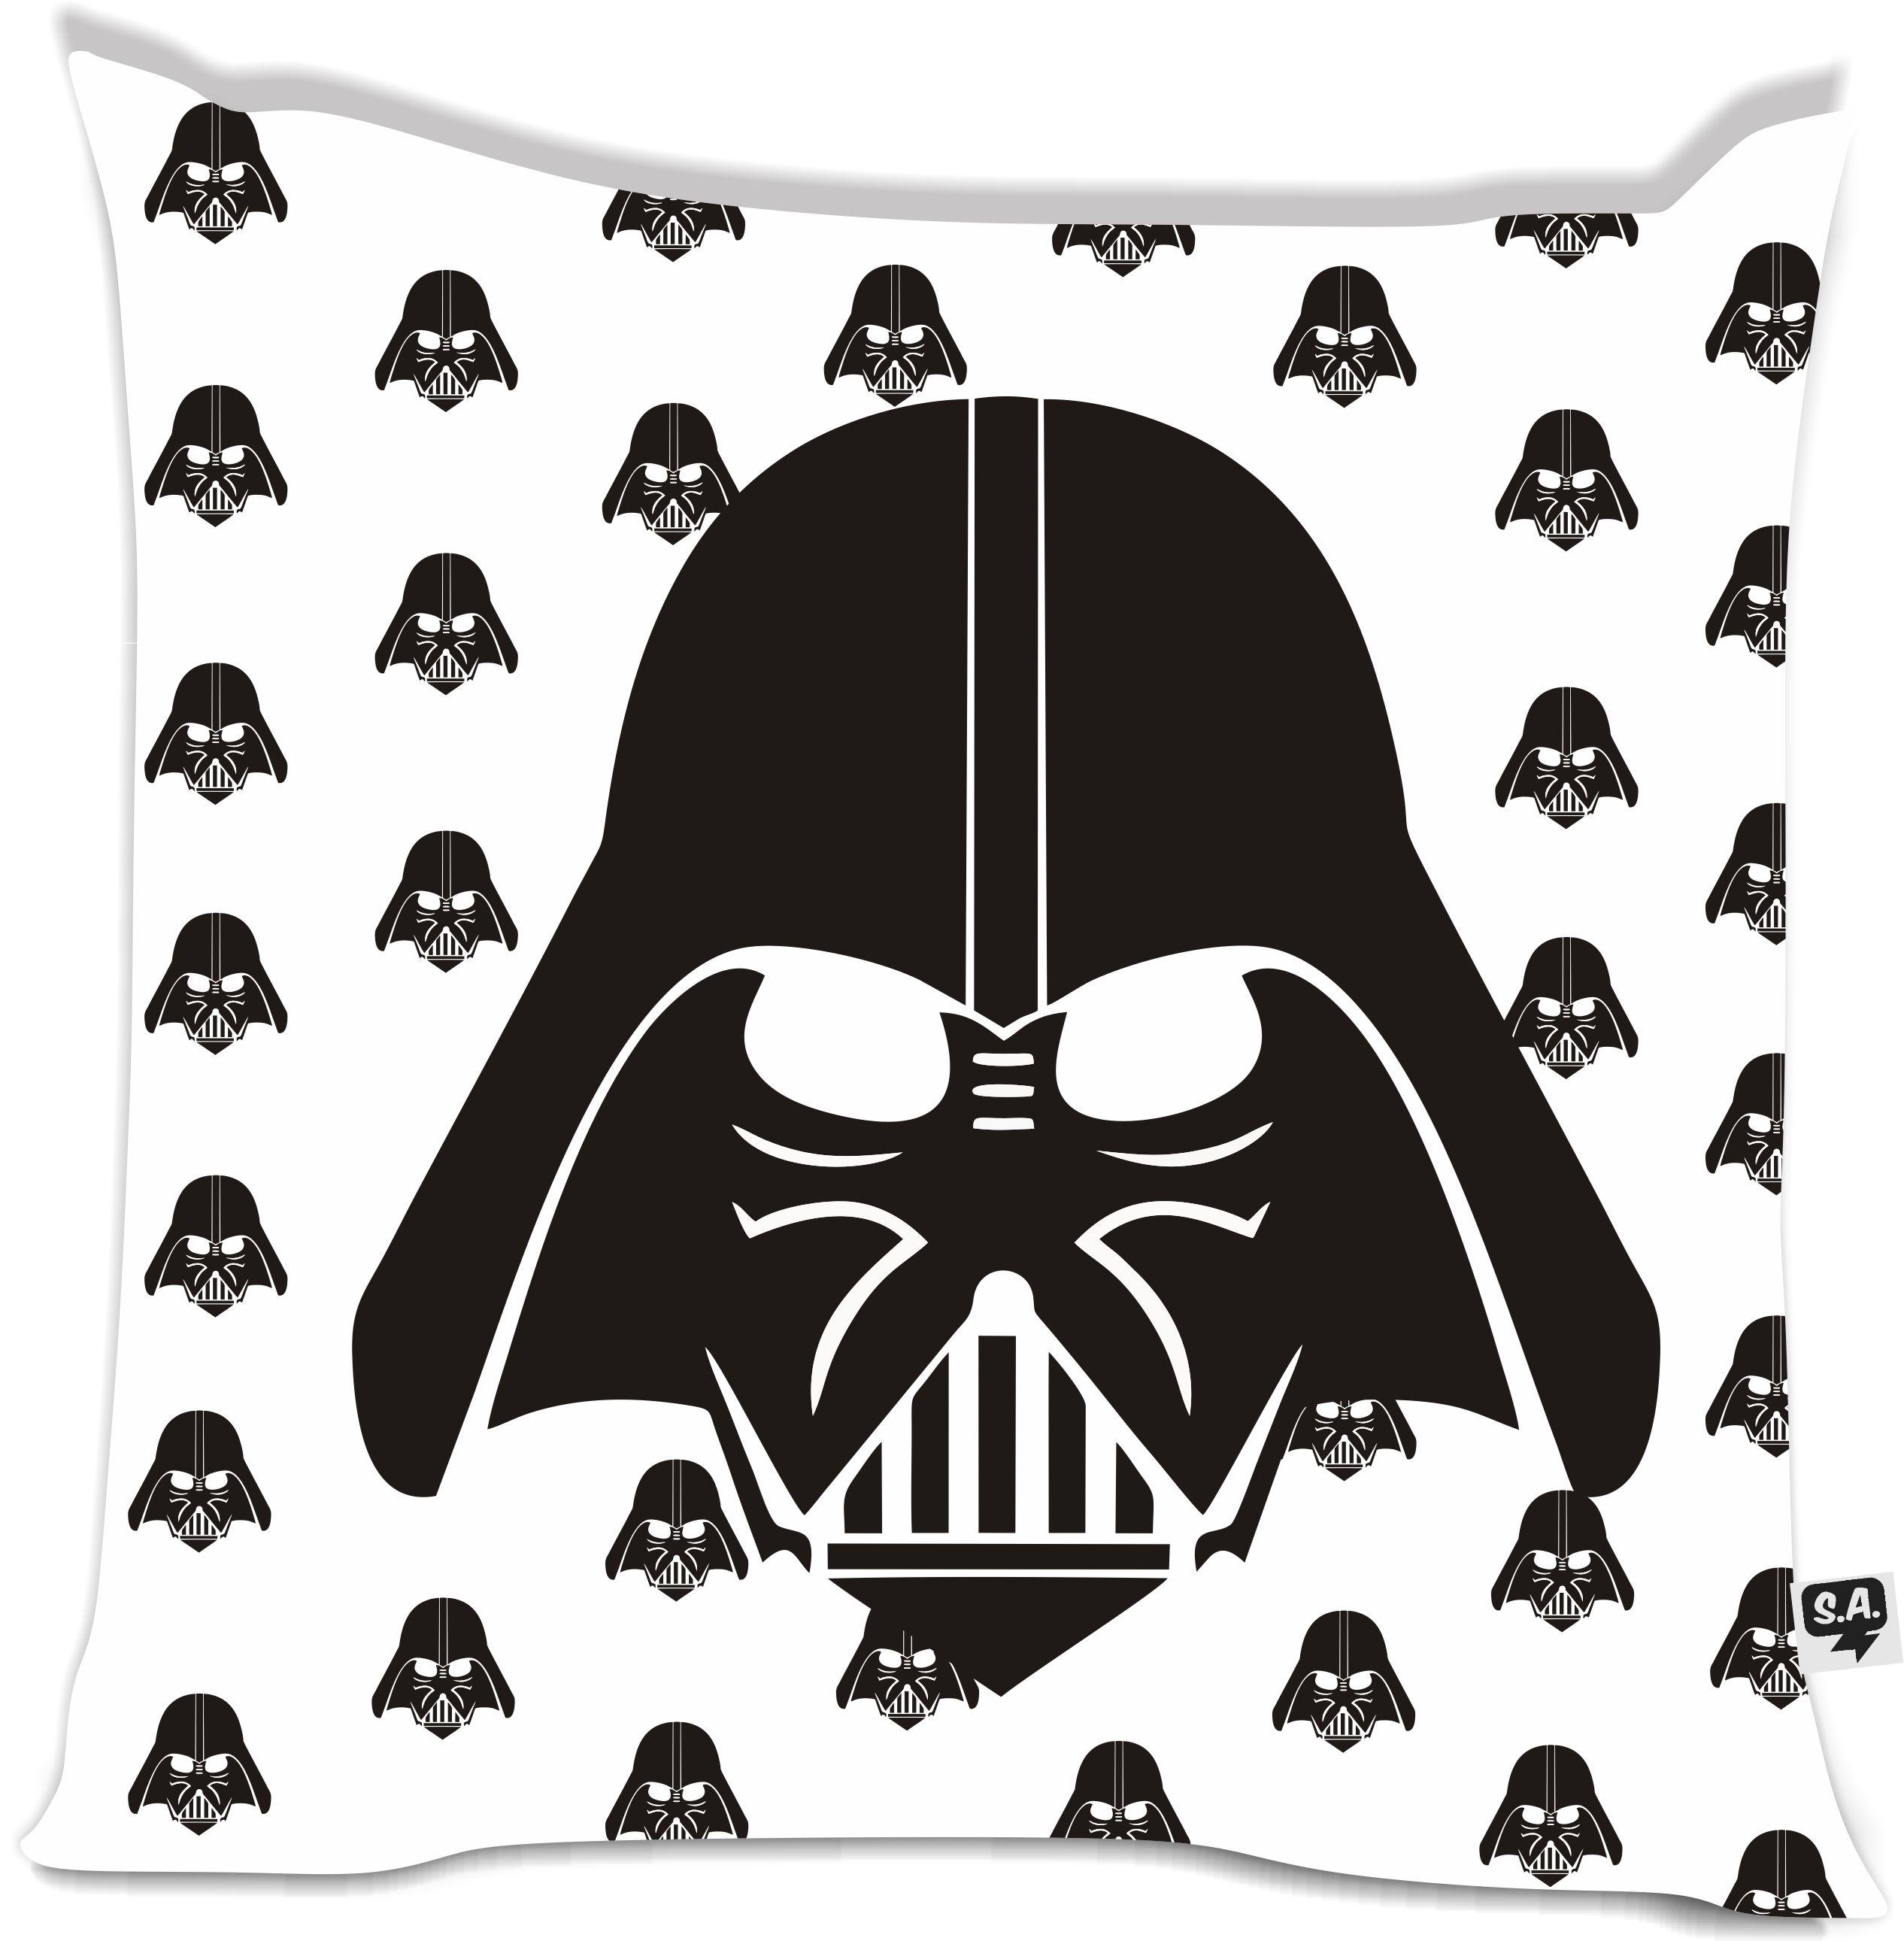 Almofada Darth Vader Mascara No Elo7 Camiseteria Sa 53ed76